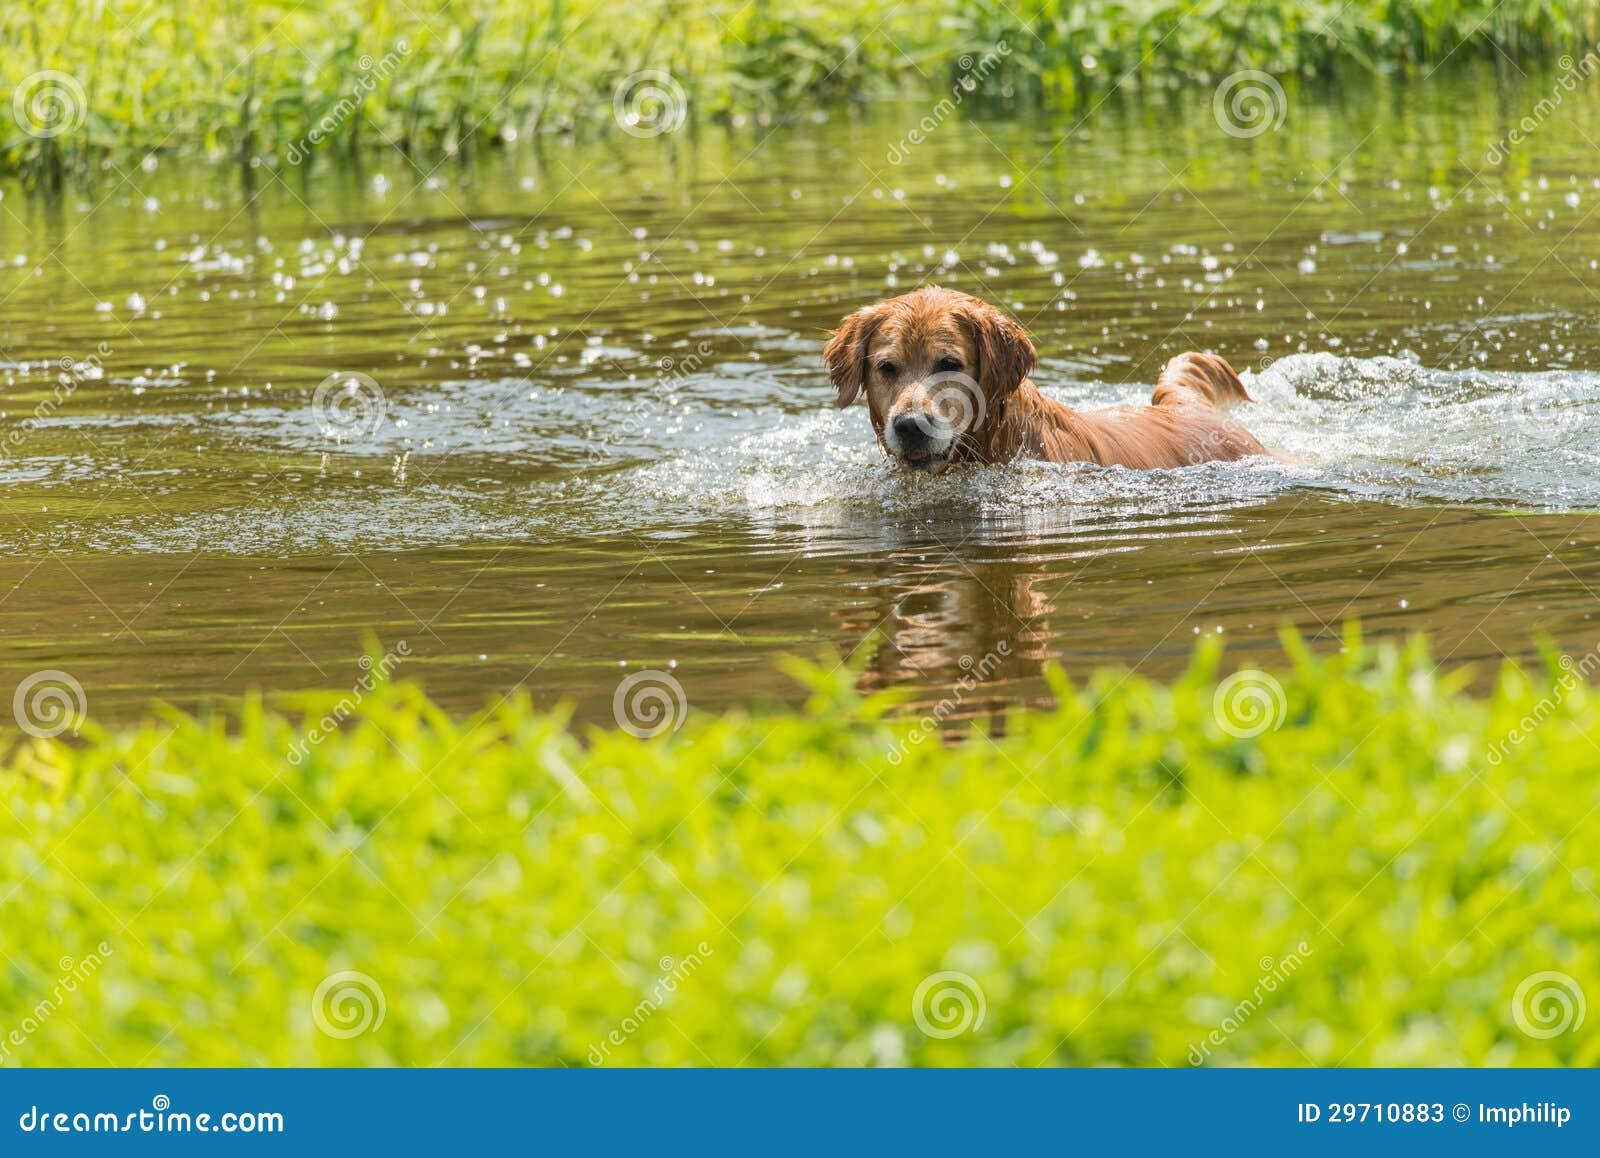 A swimming dog